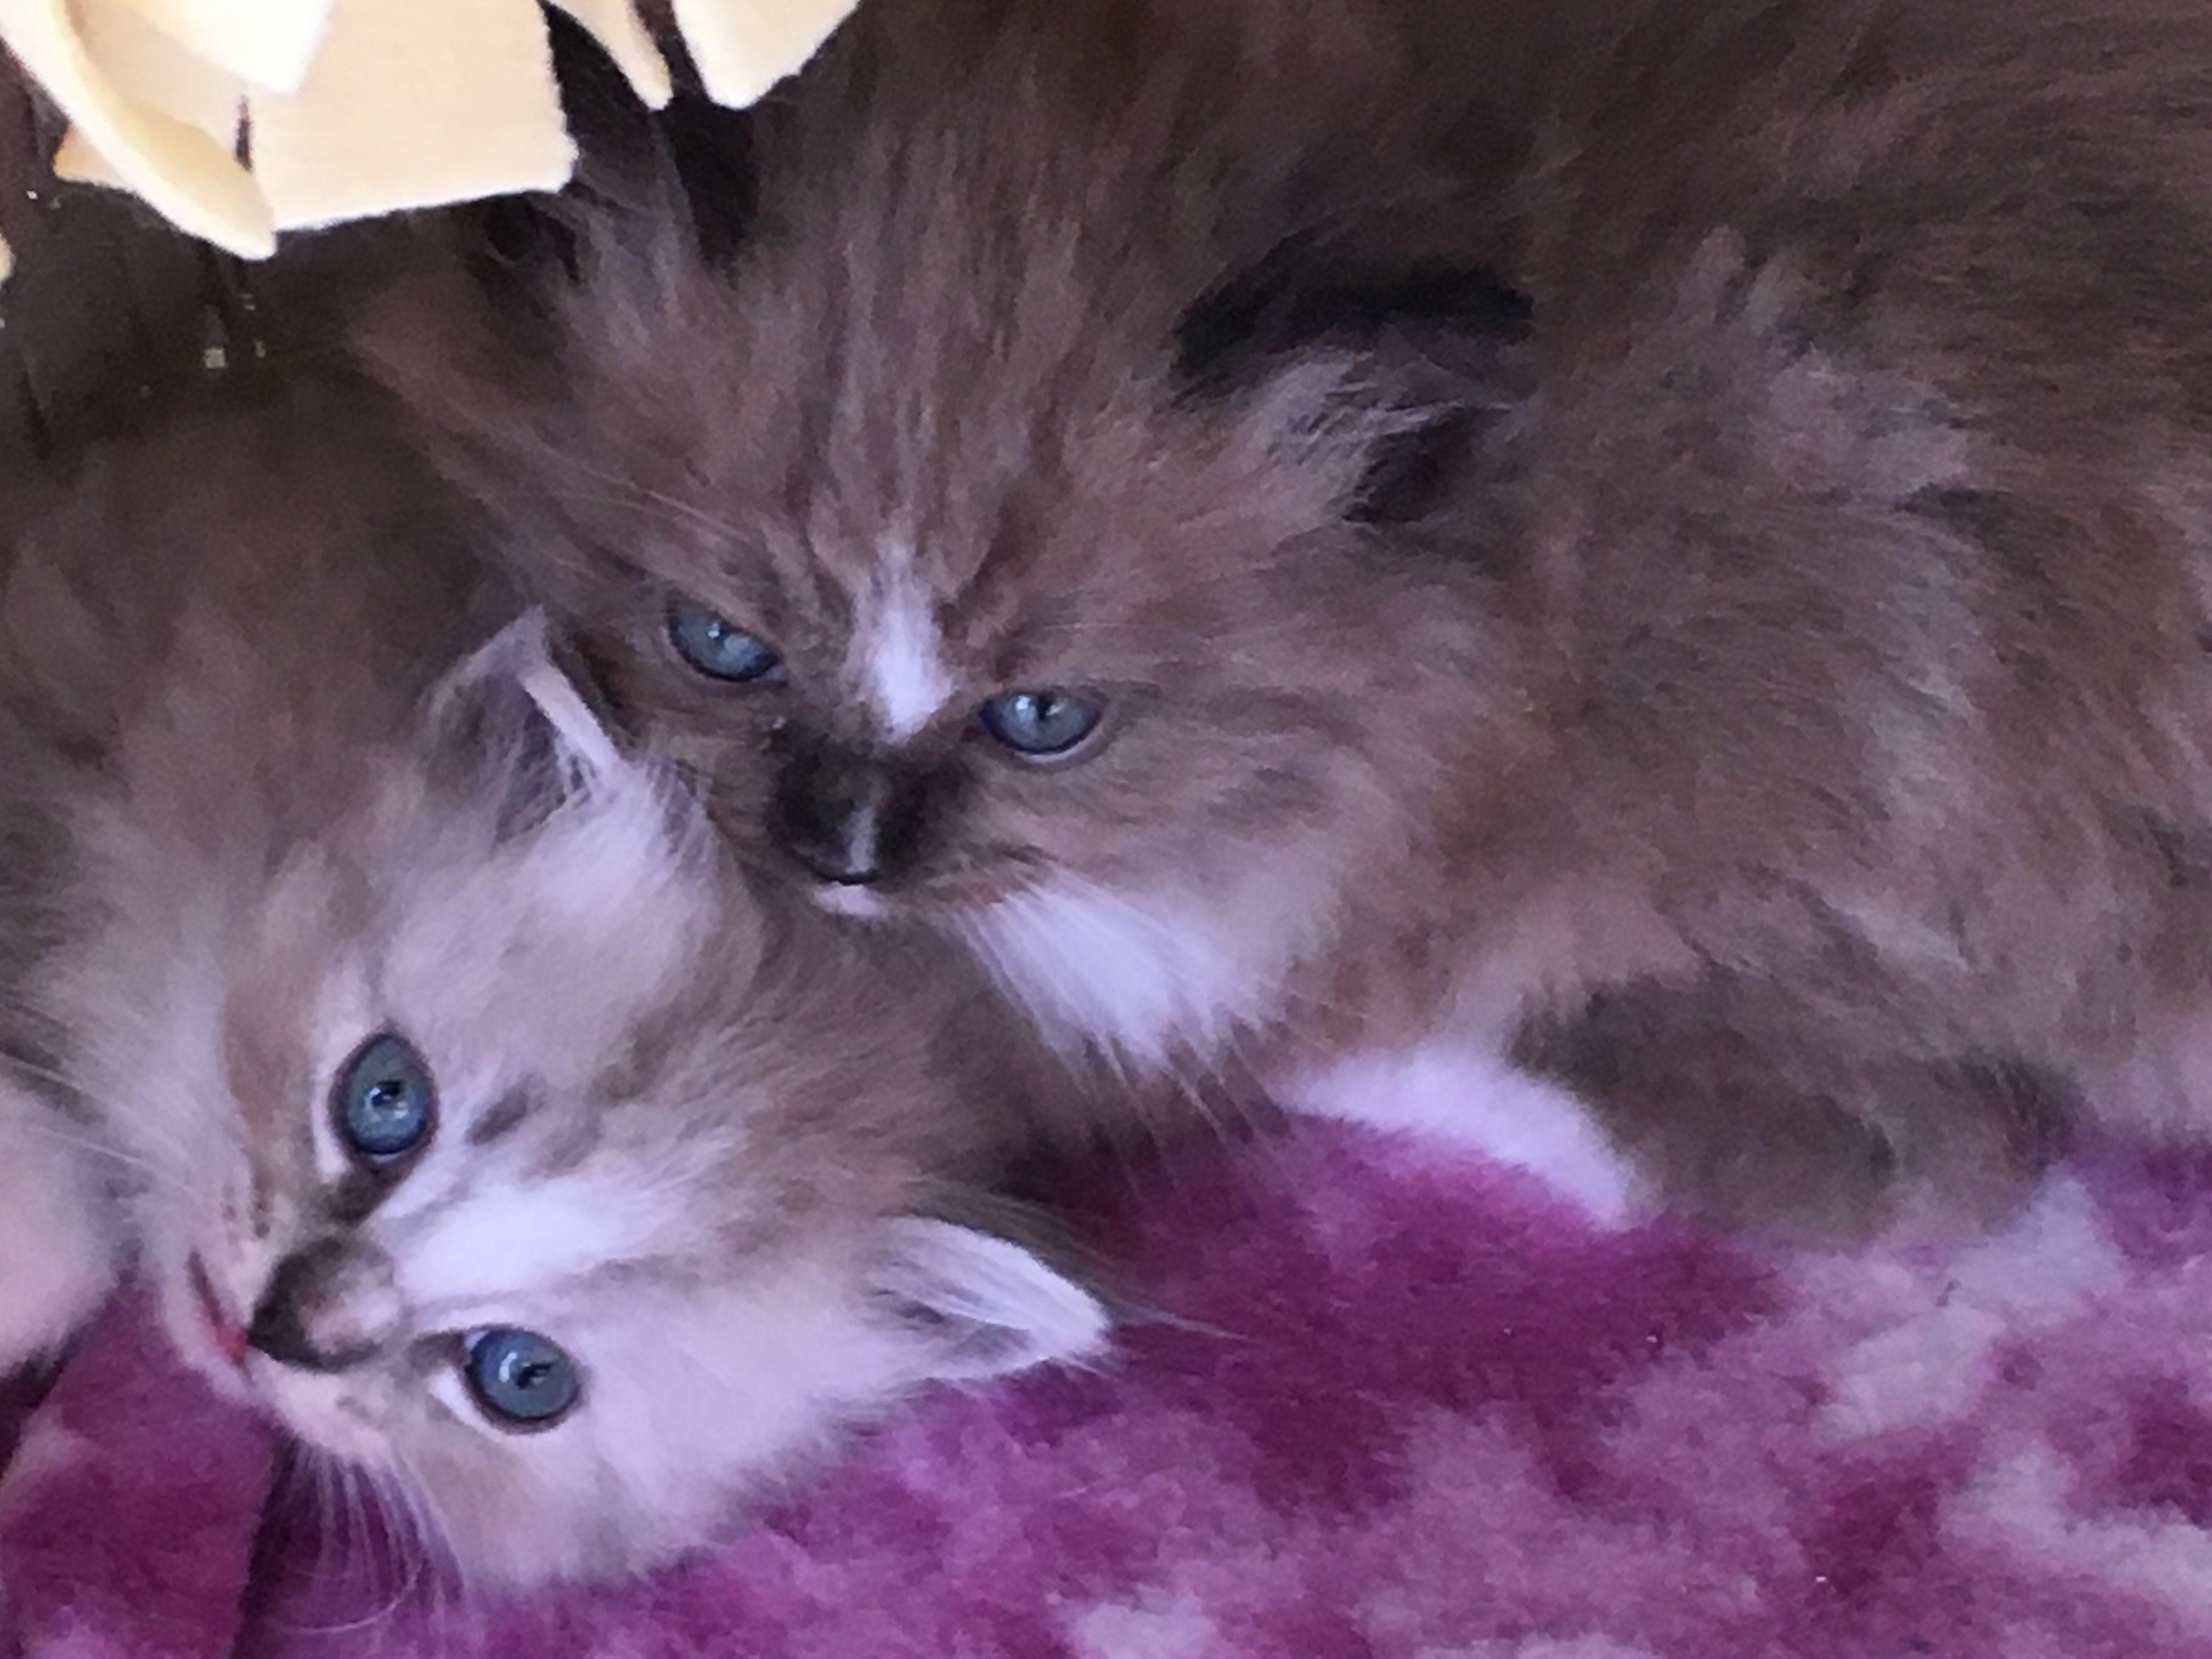 RagaMuffin kittens of Sweetlilpaws RagaMuffins